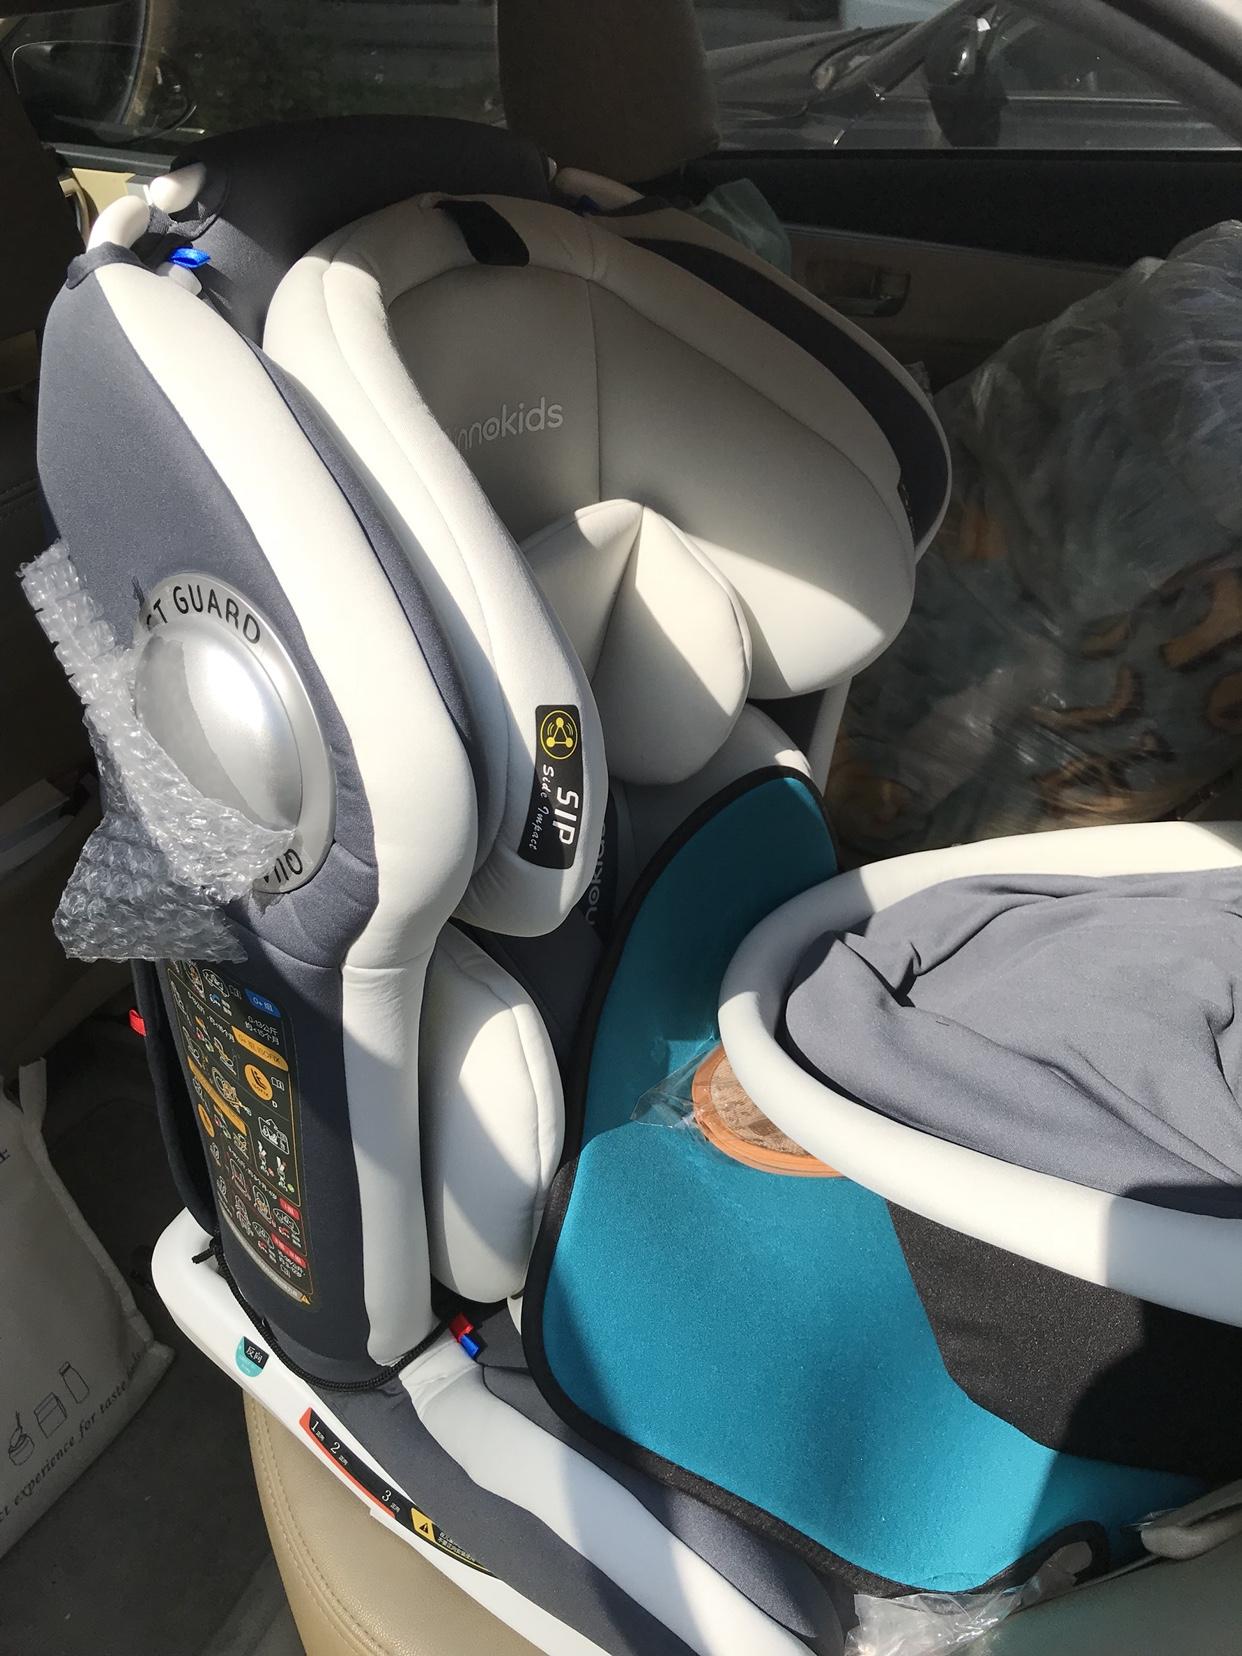 innokids安全儿童桌椅怎么样,值得买吗?